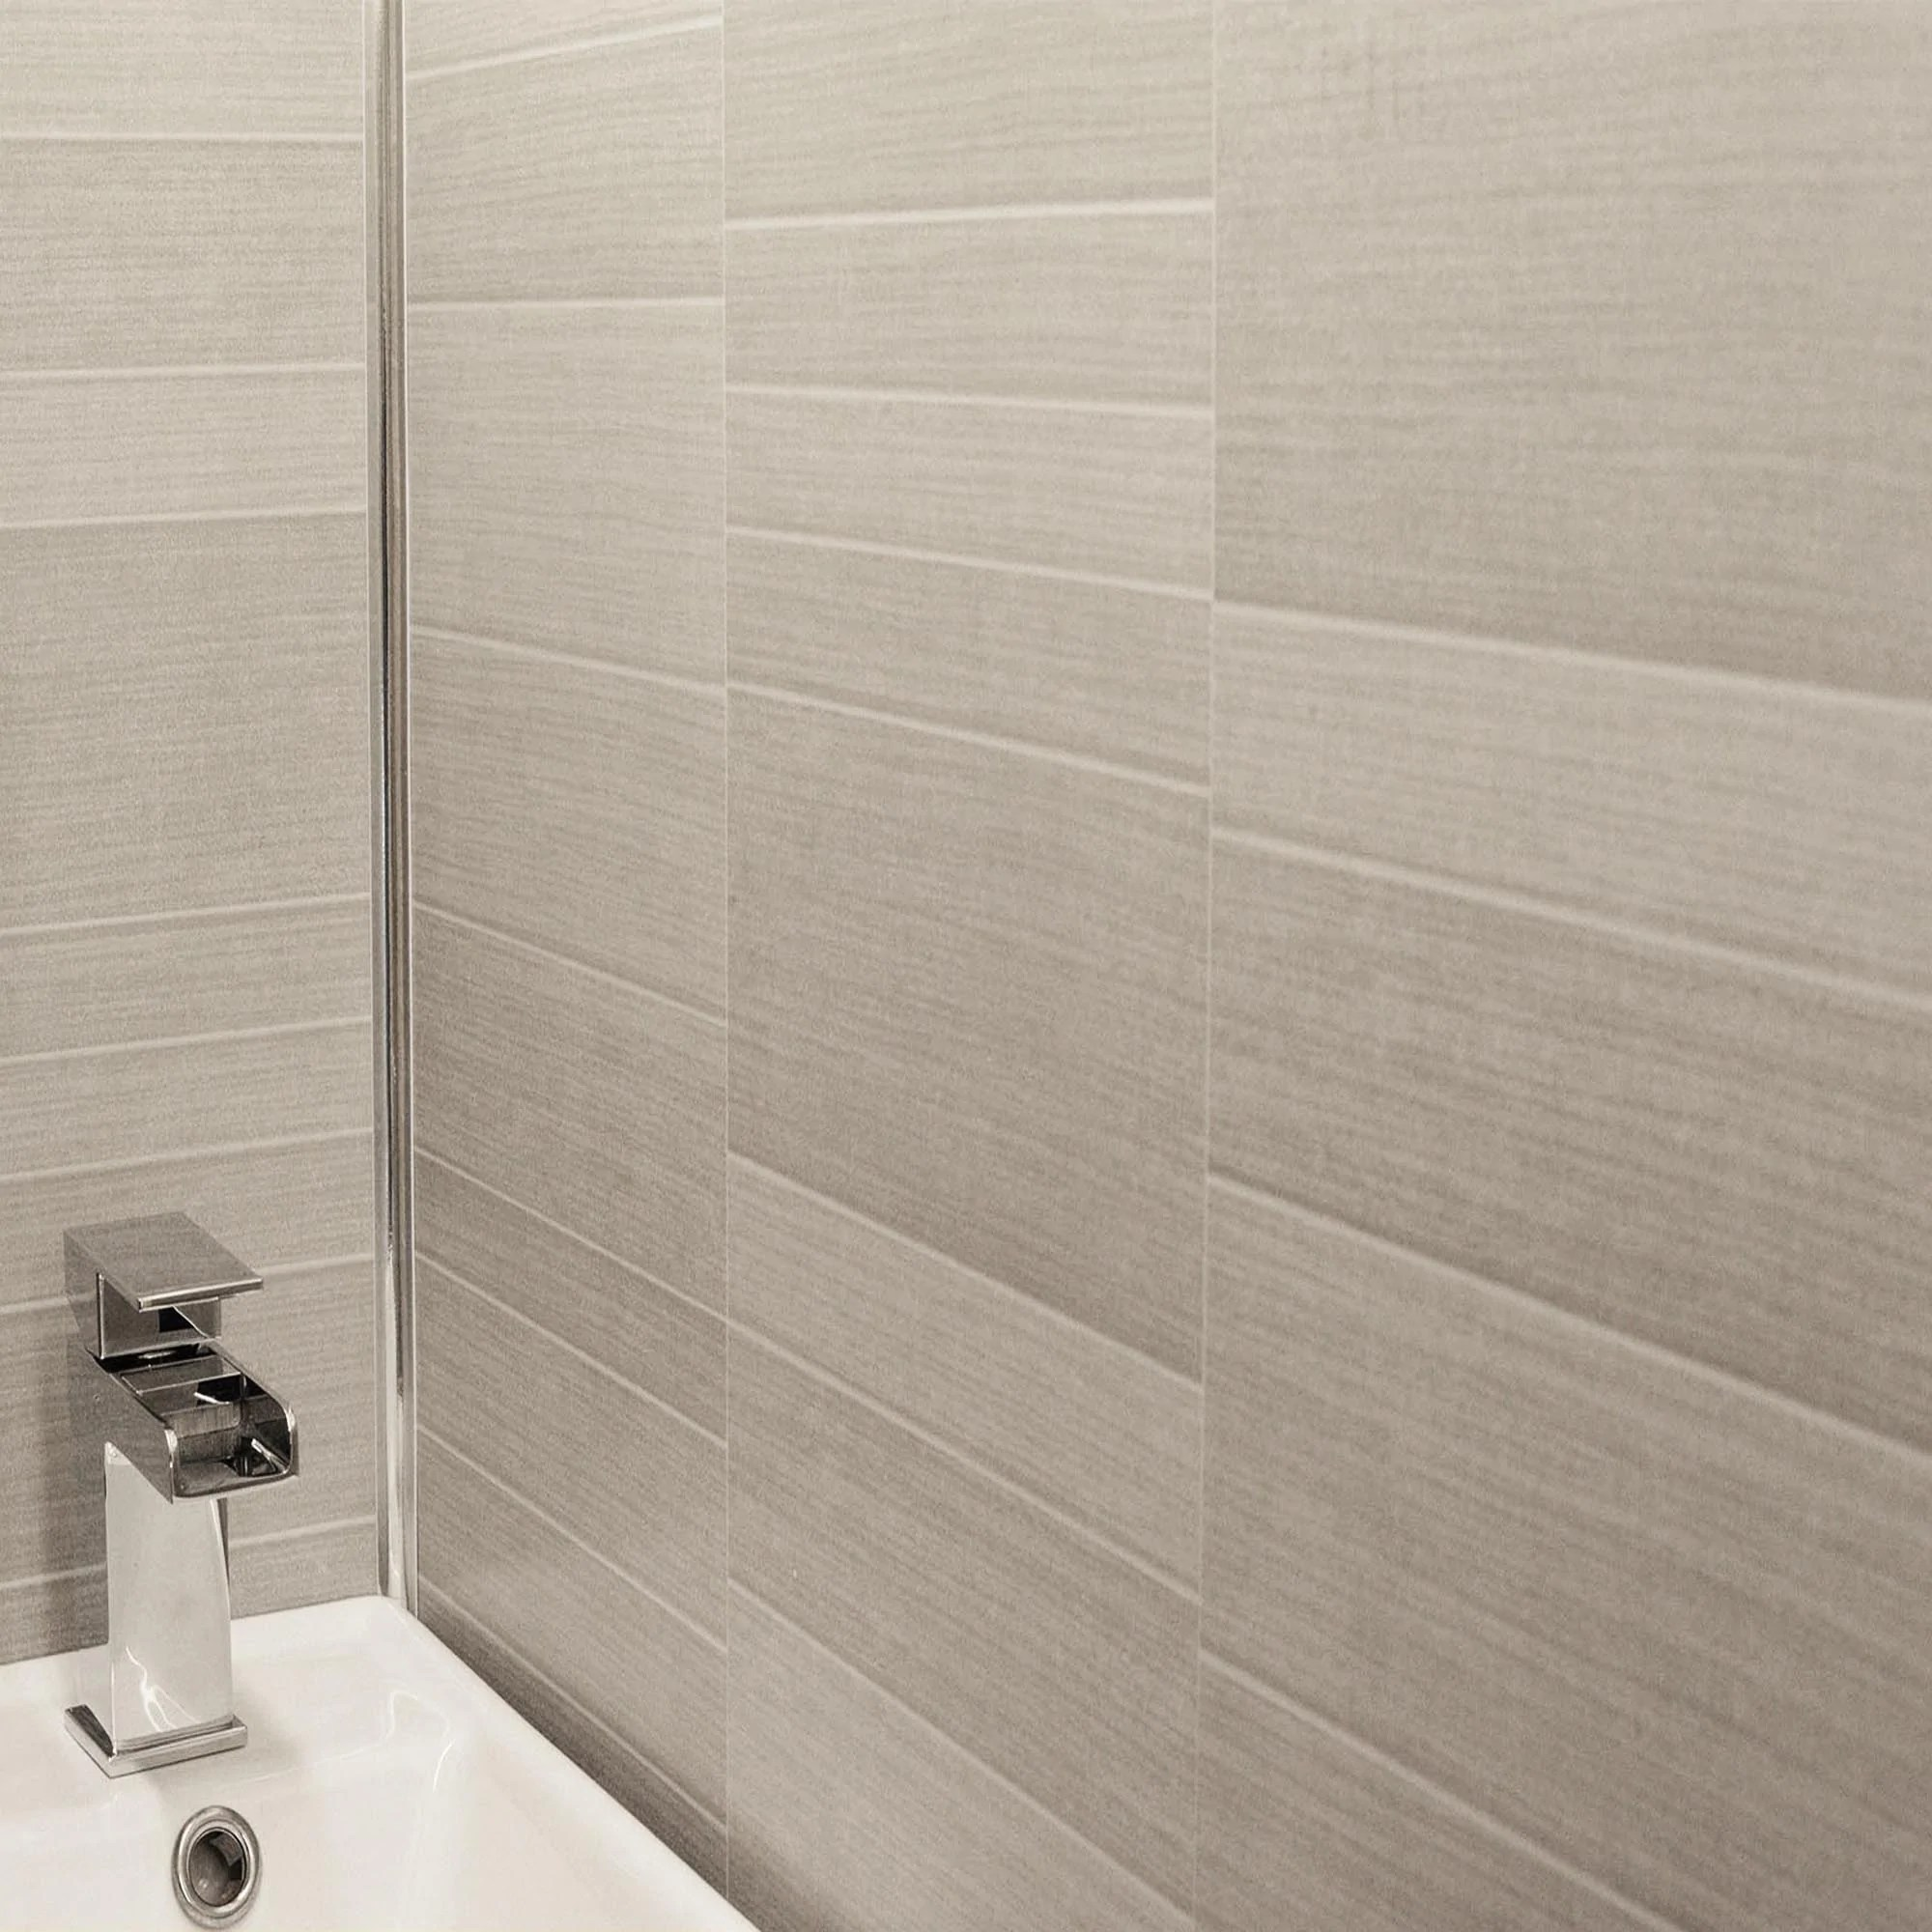 Light Grey Small Tile Effect Bathroom Wall Panels Pvc 5mm Thick Cladding 2 6m X 250mm Claddtech